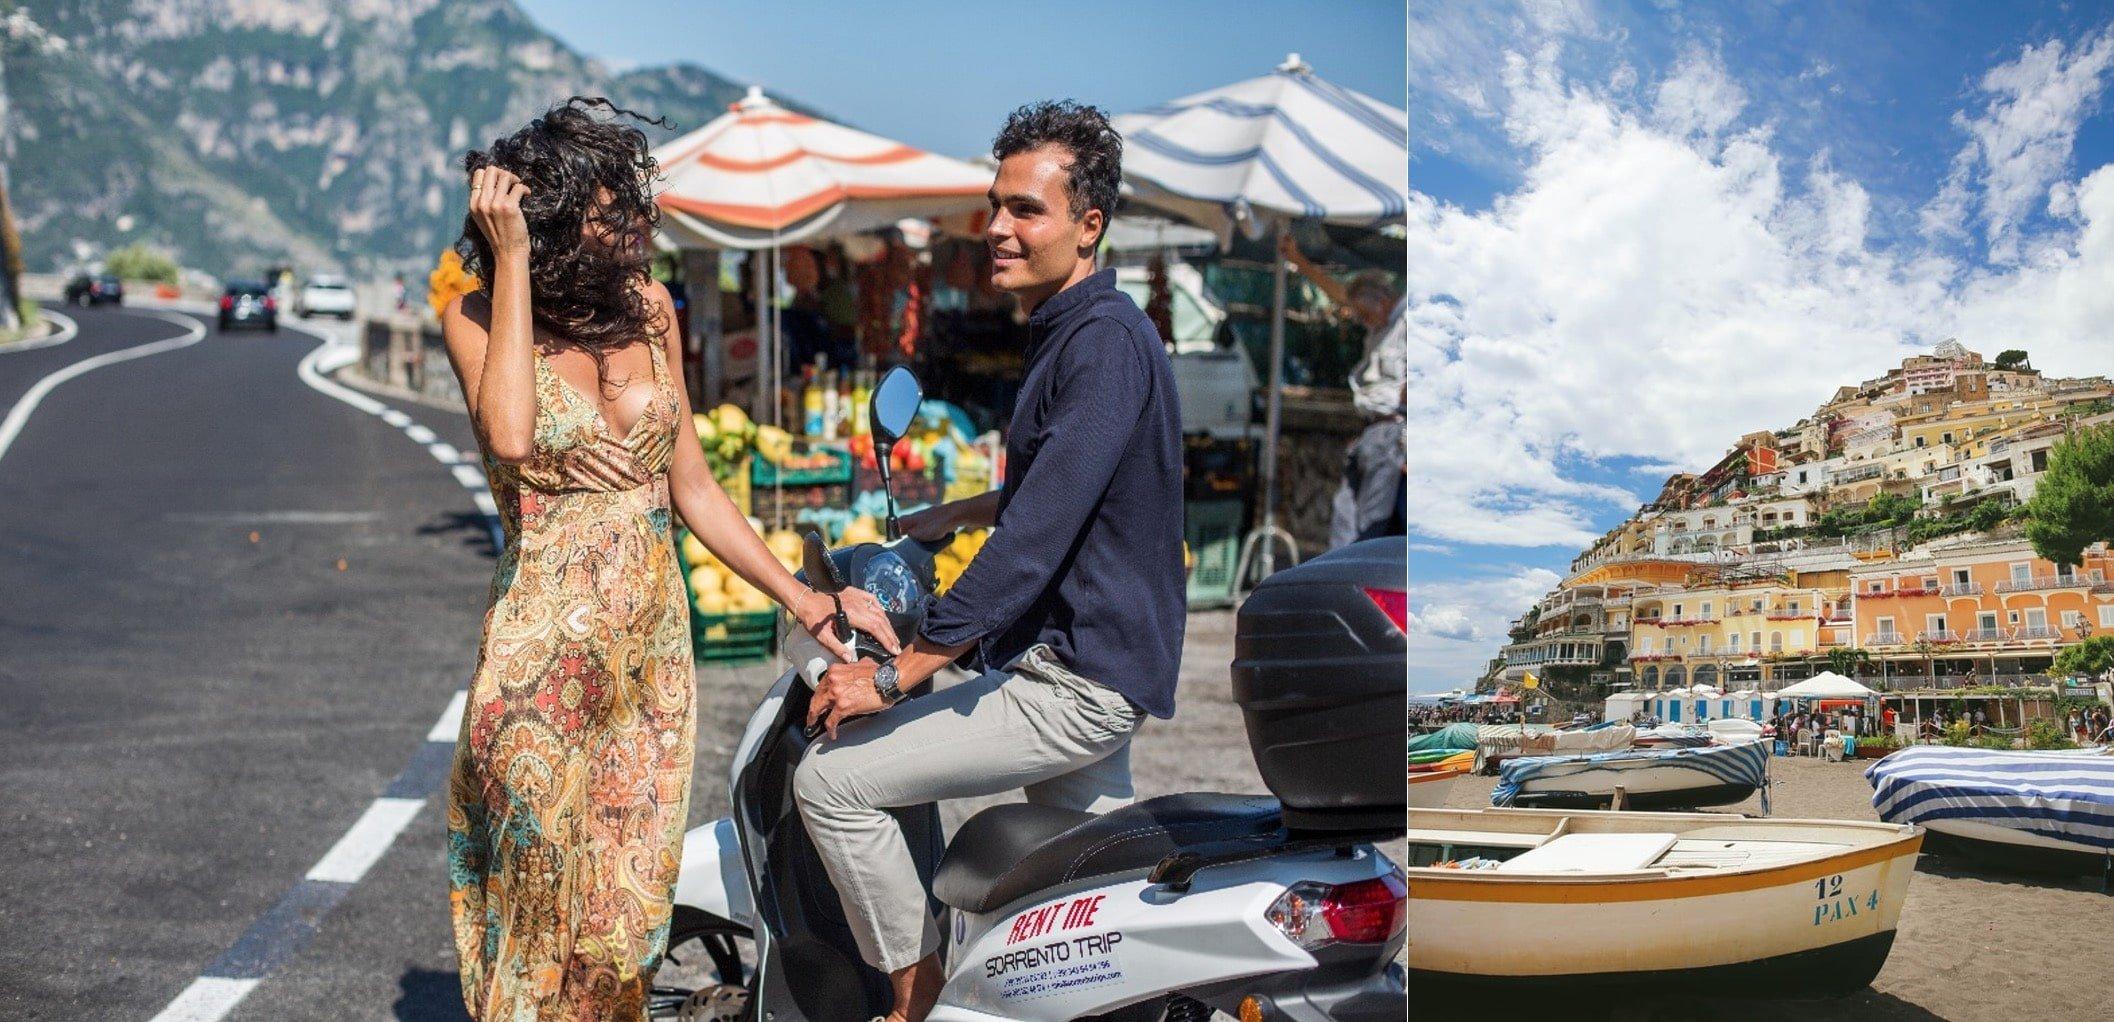 Costo noleggio scooter costiera amalfitana